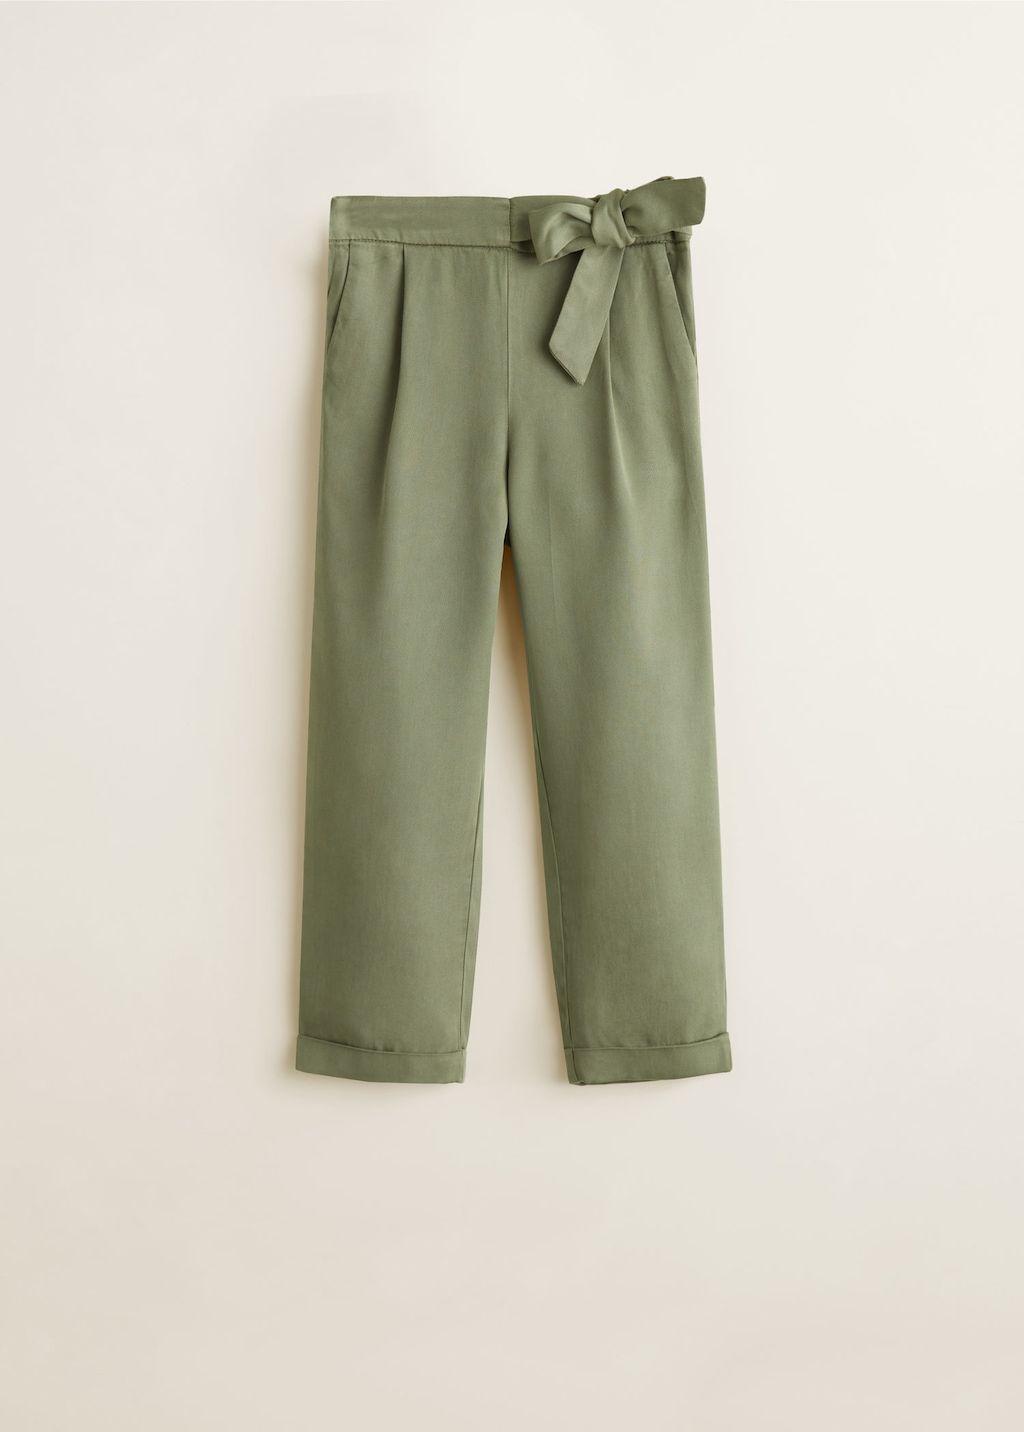 6ba828b0817af0 Pantalon droit soft - Fille | PANTALON FLUIDE | Pantalon droit ...